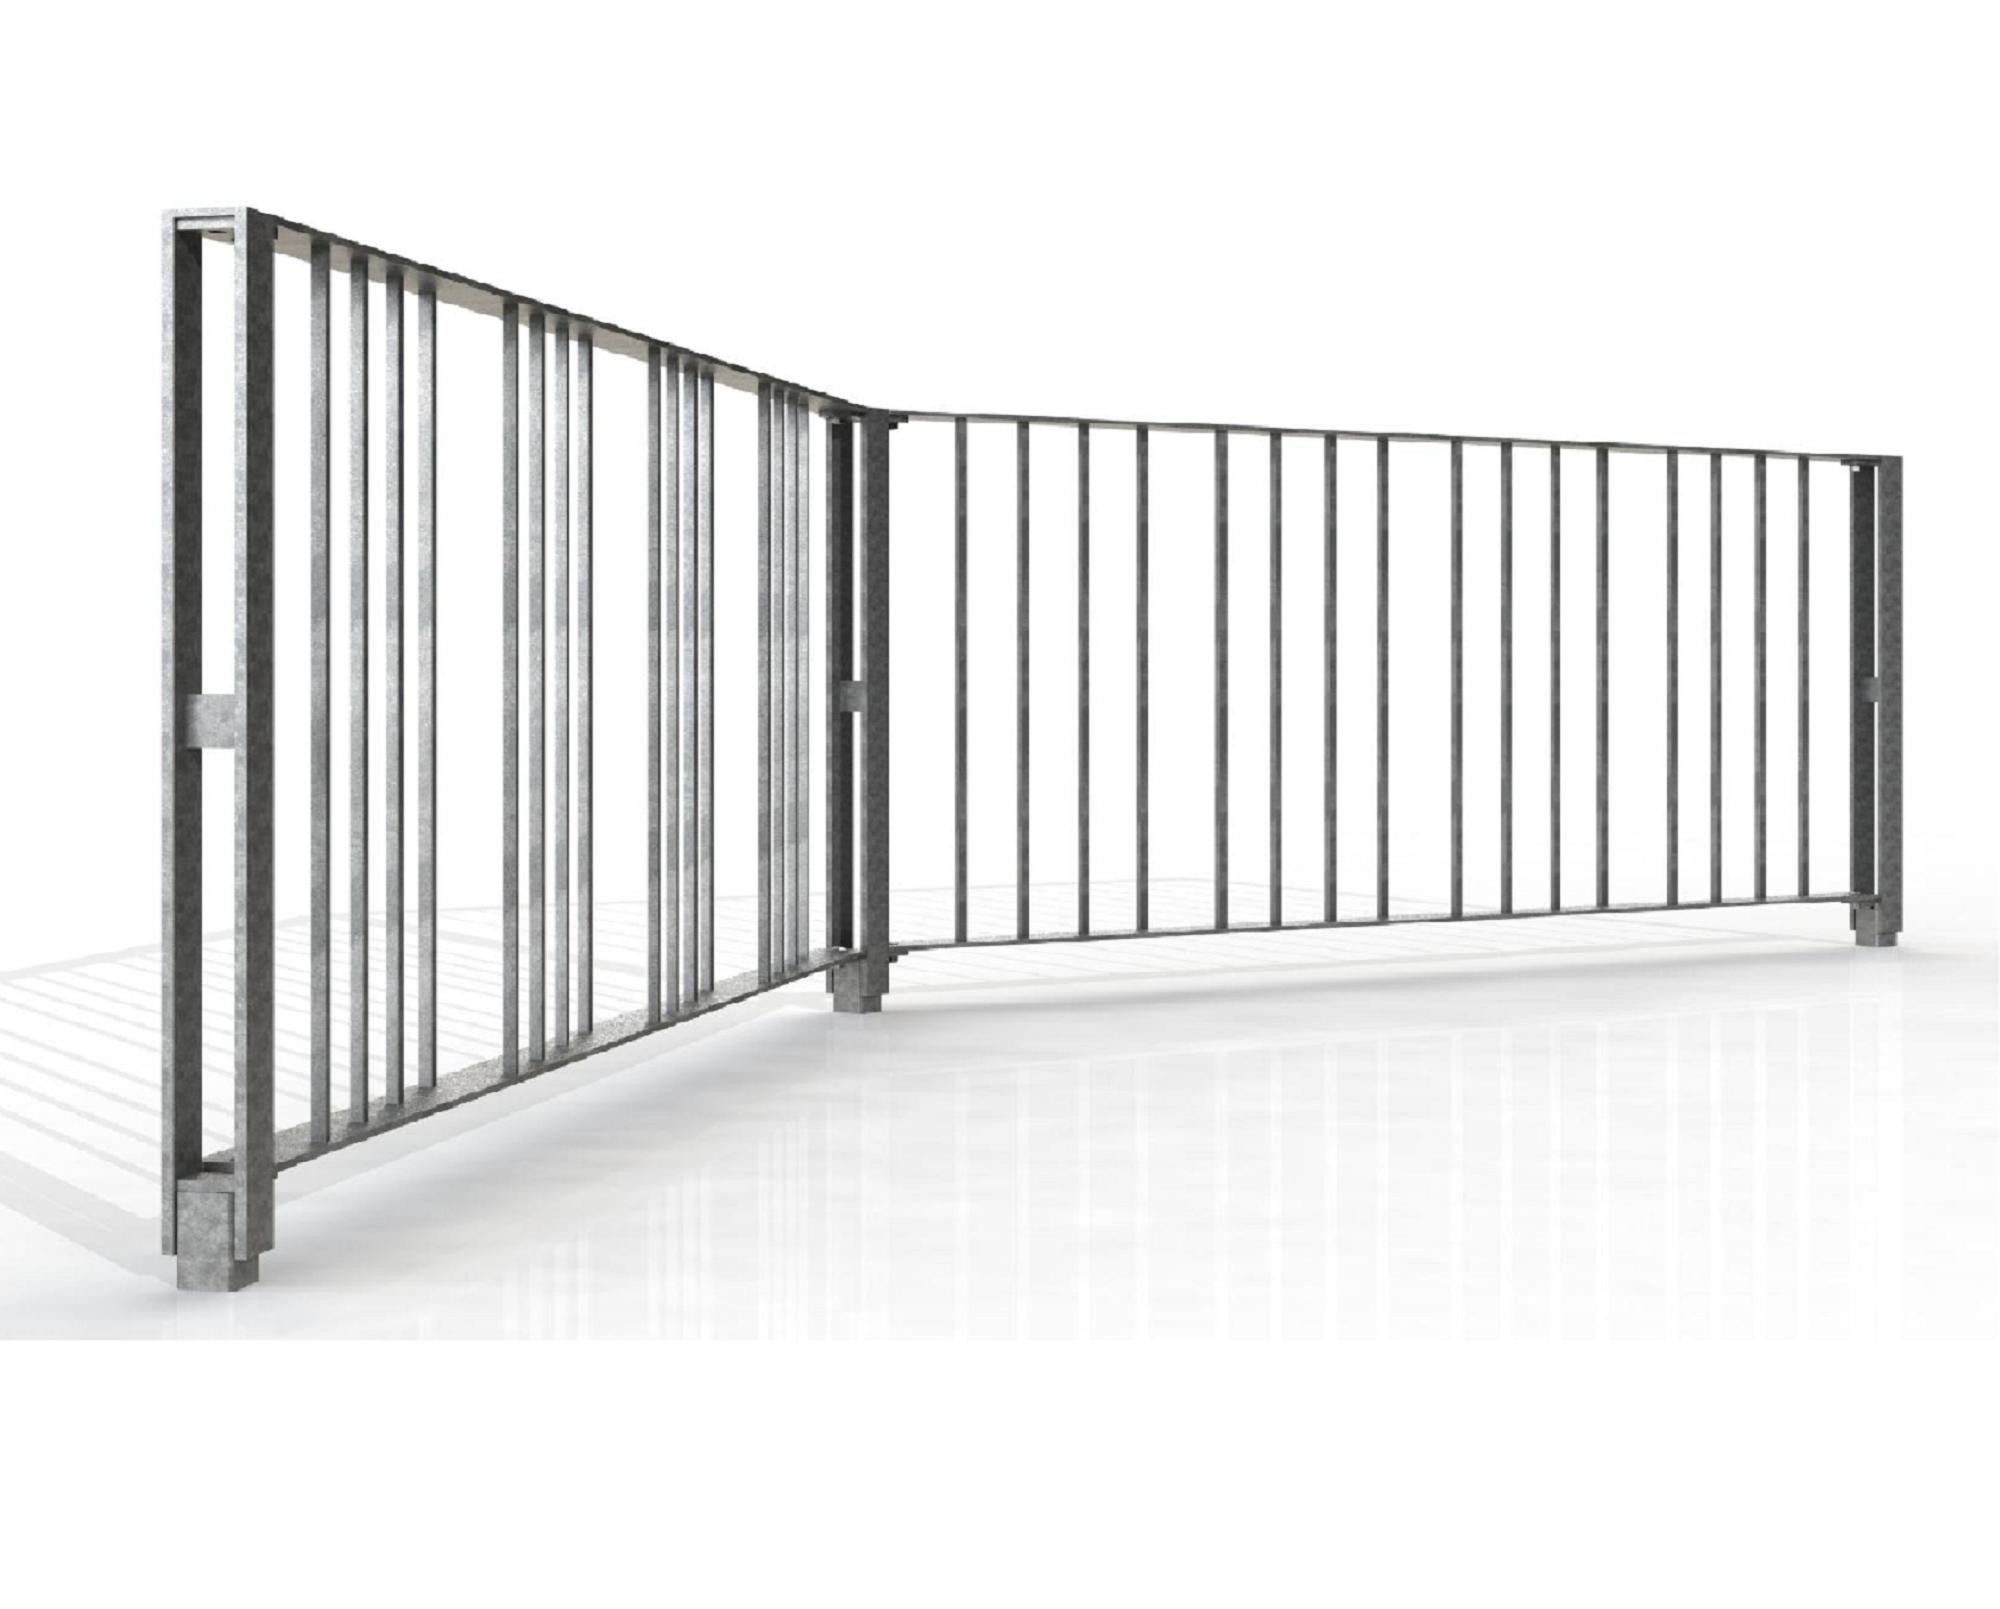 Security bollards guards rail street furniture